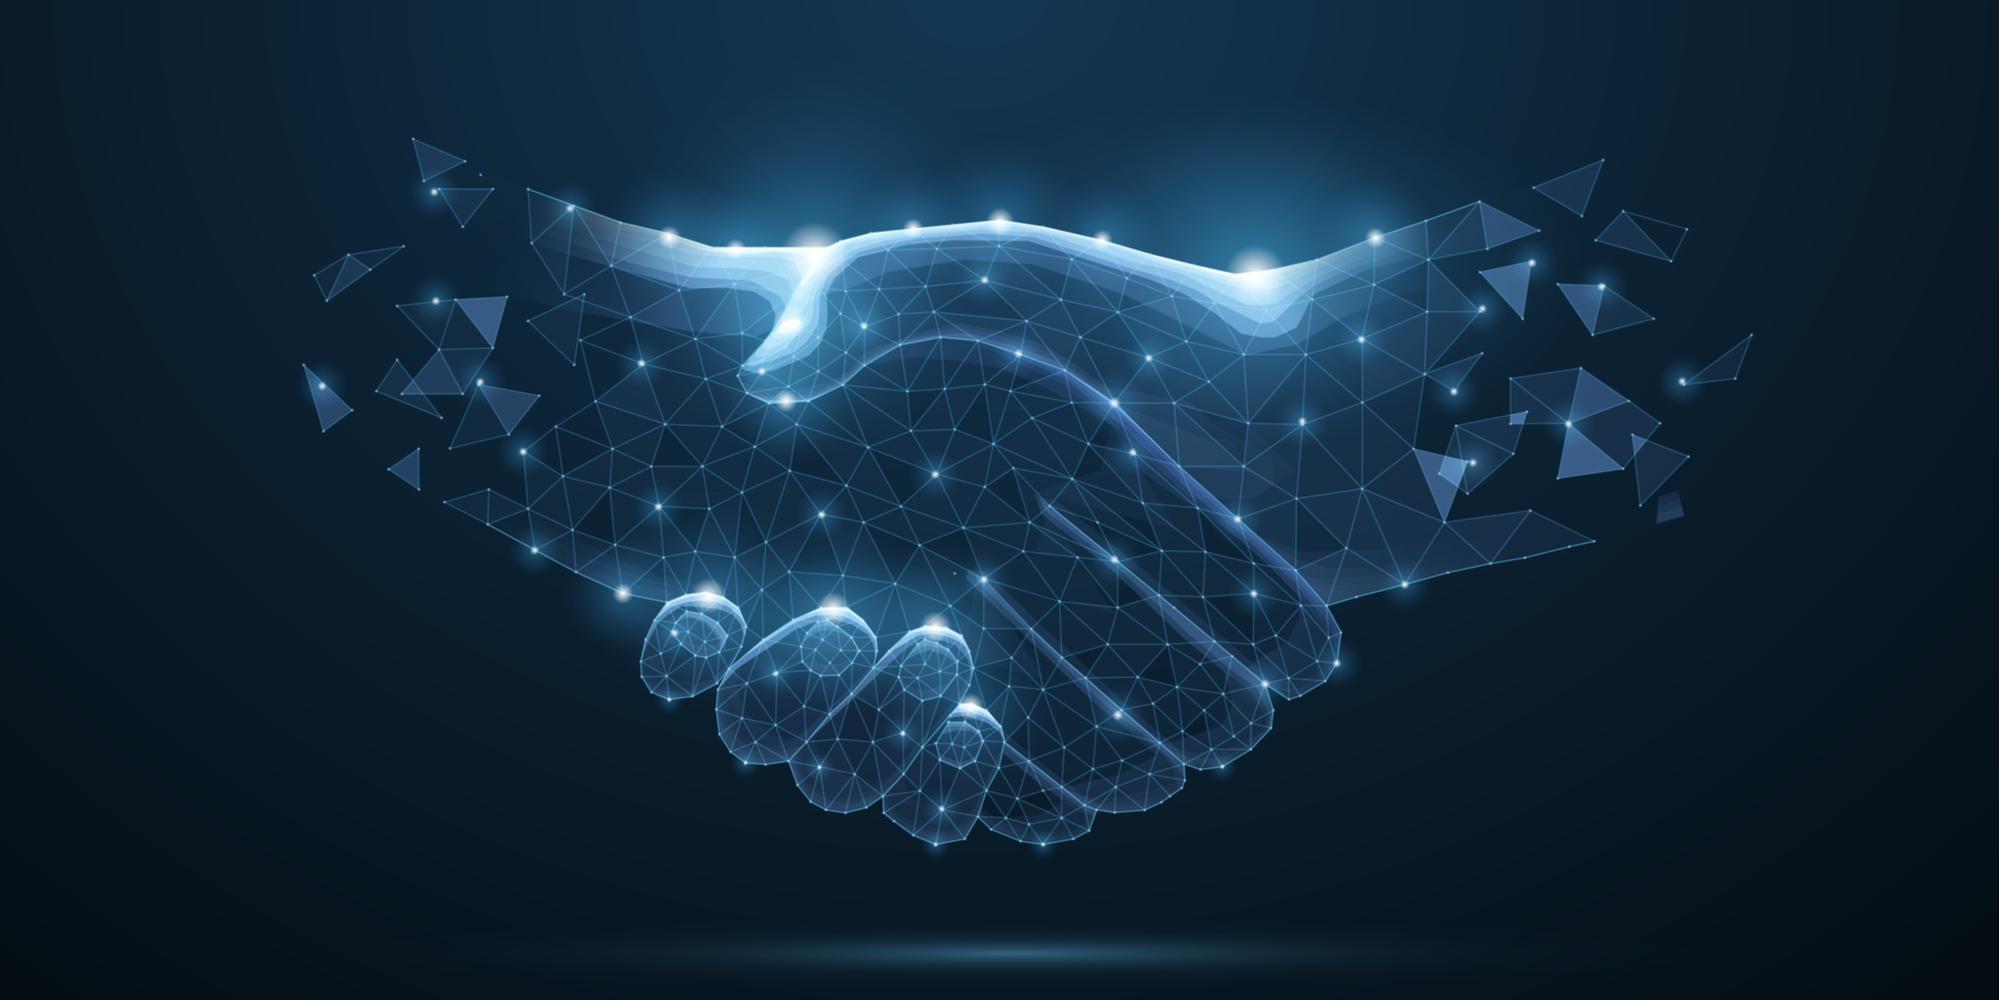 LORCA partners with Kx to enhance cyber scaleups with analytics